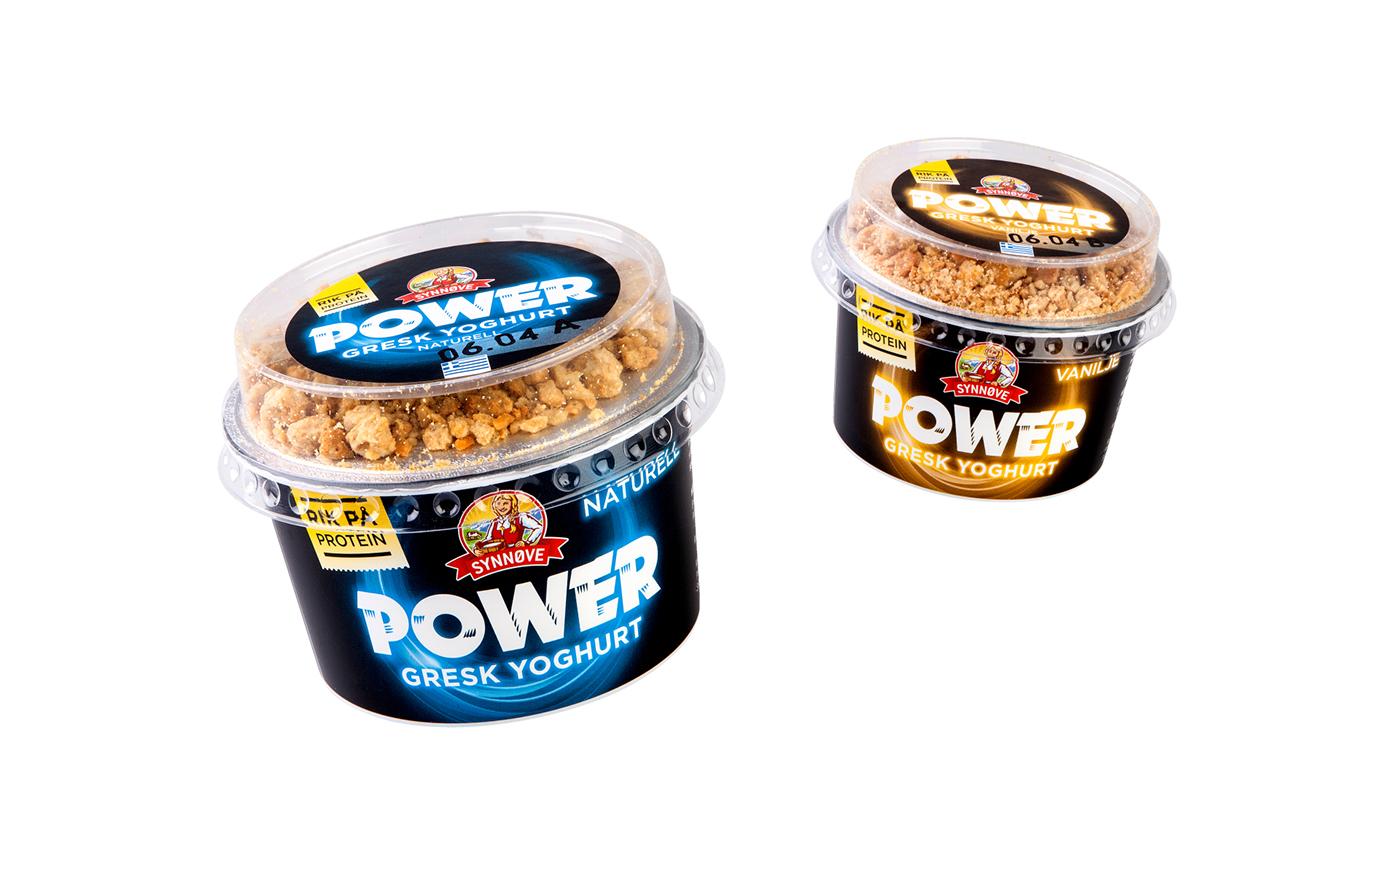 norway Synnøve Finden power yoghurt greek yoghurt fjeldheimpartners concept logo identity